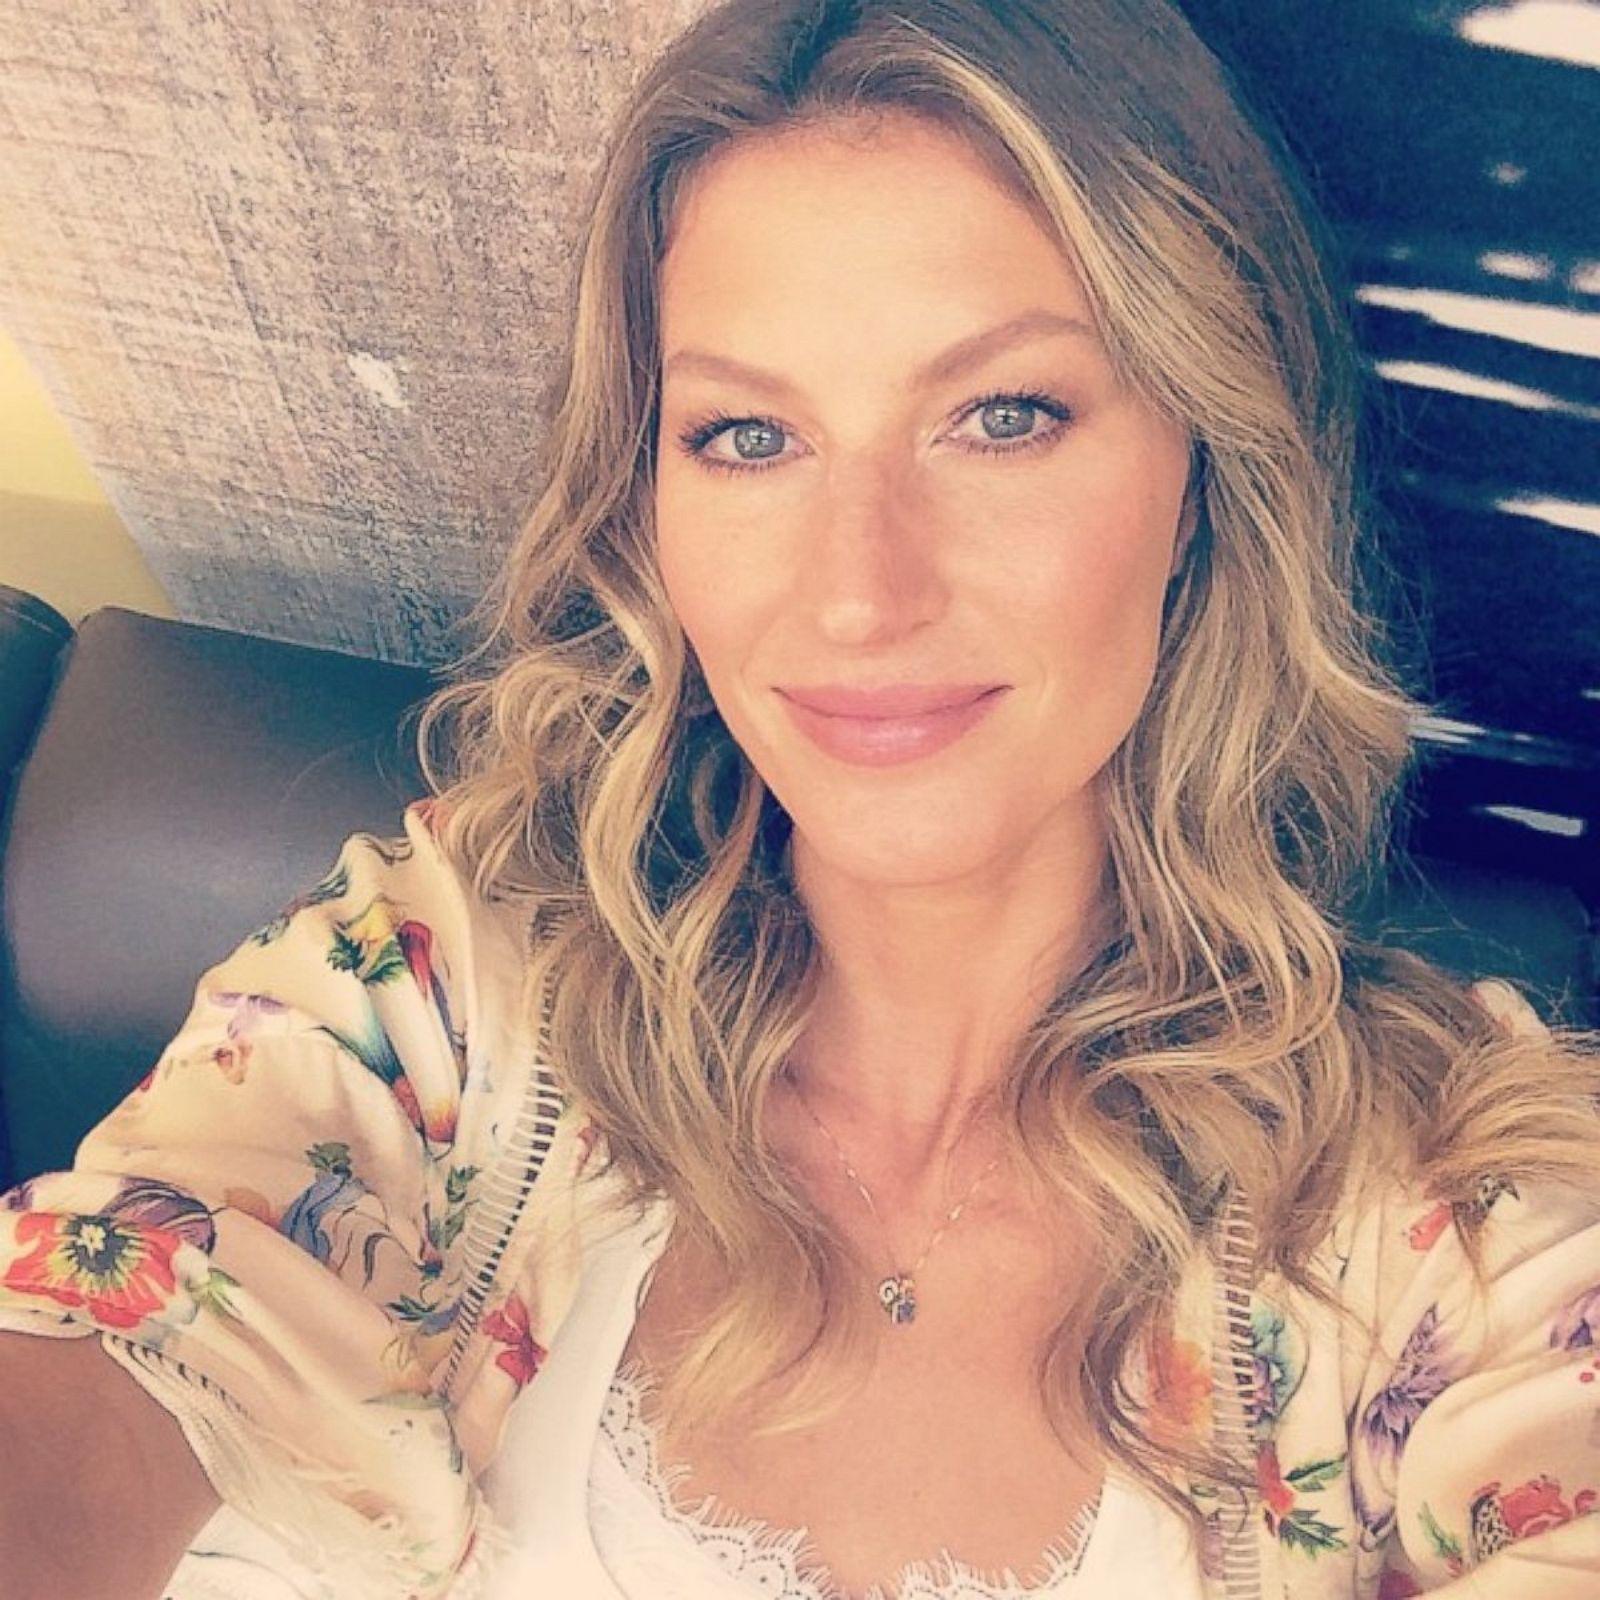 Selfie Gisele Bundchen nude photos 2019